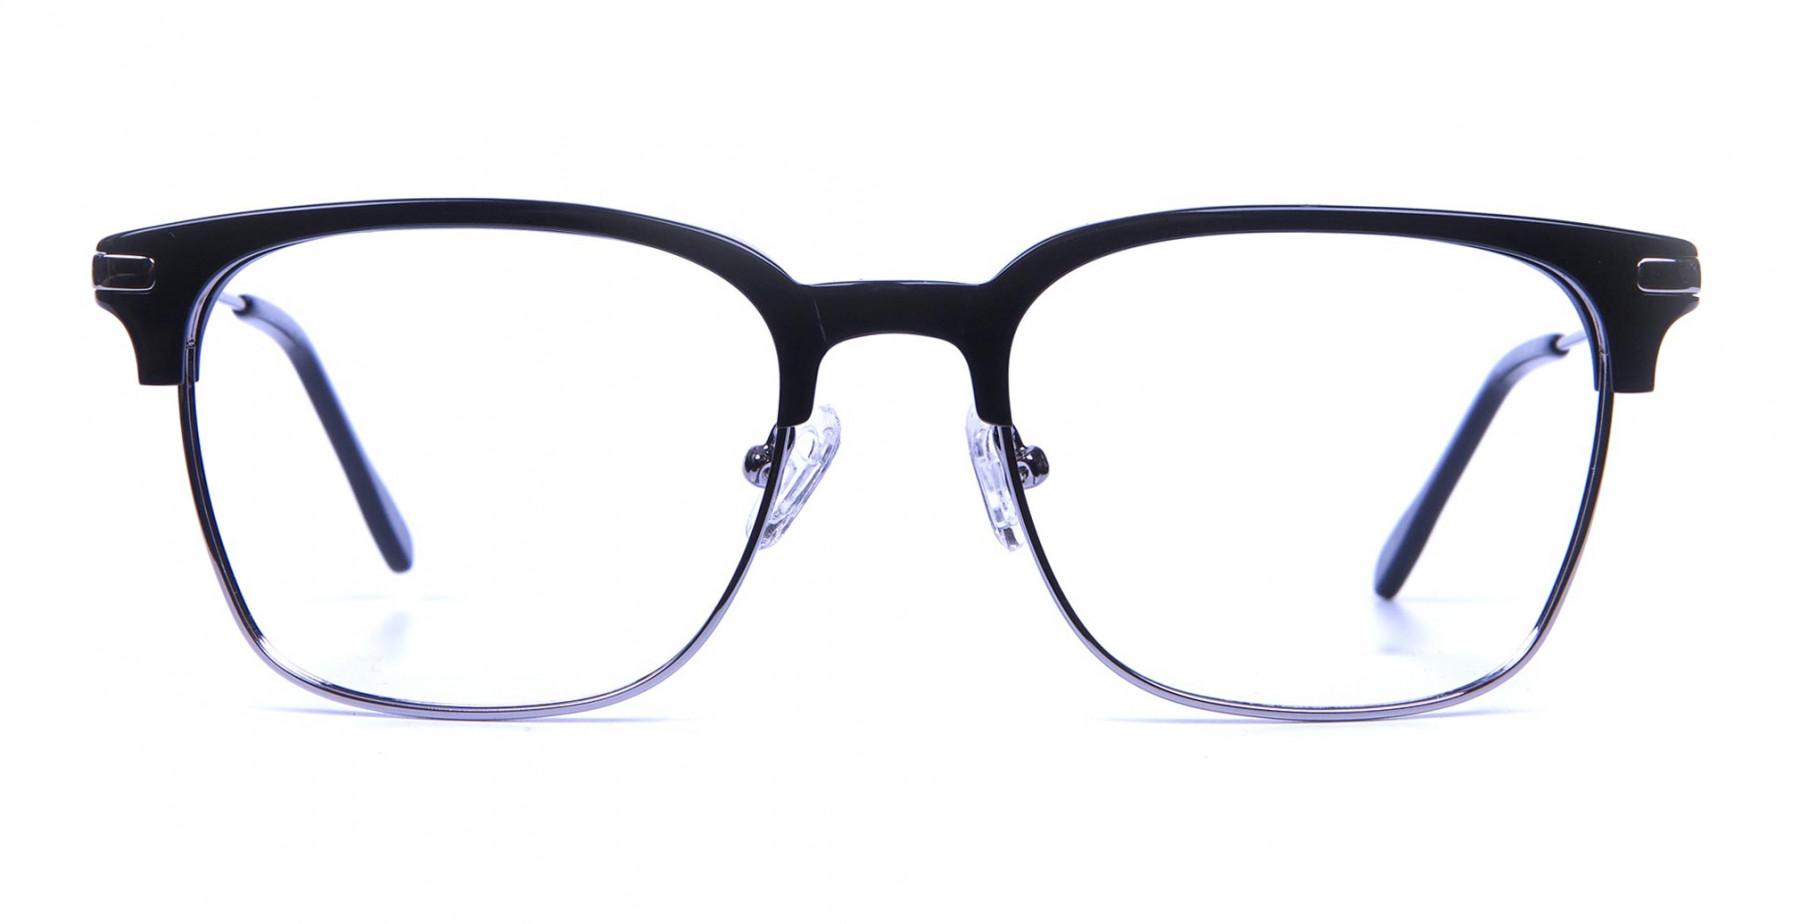 Black and Silver Browline Glasses